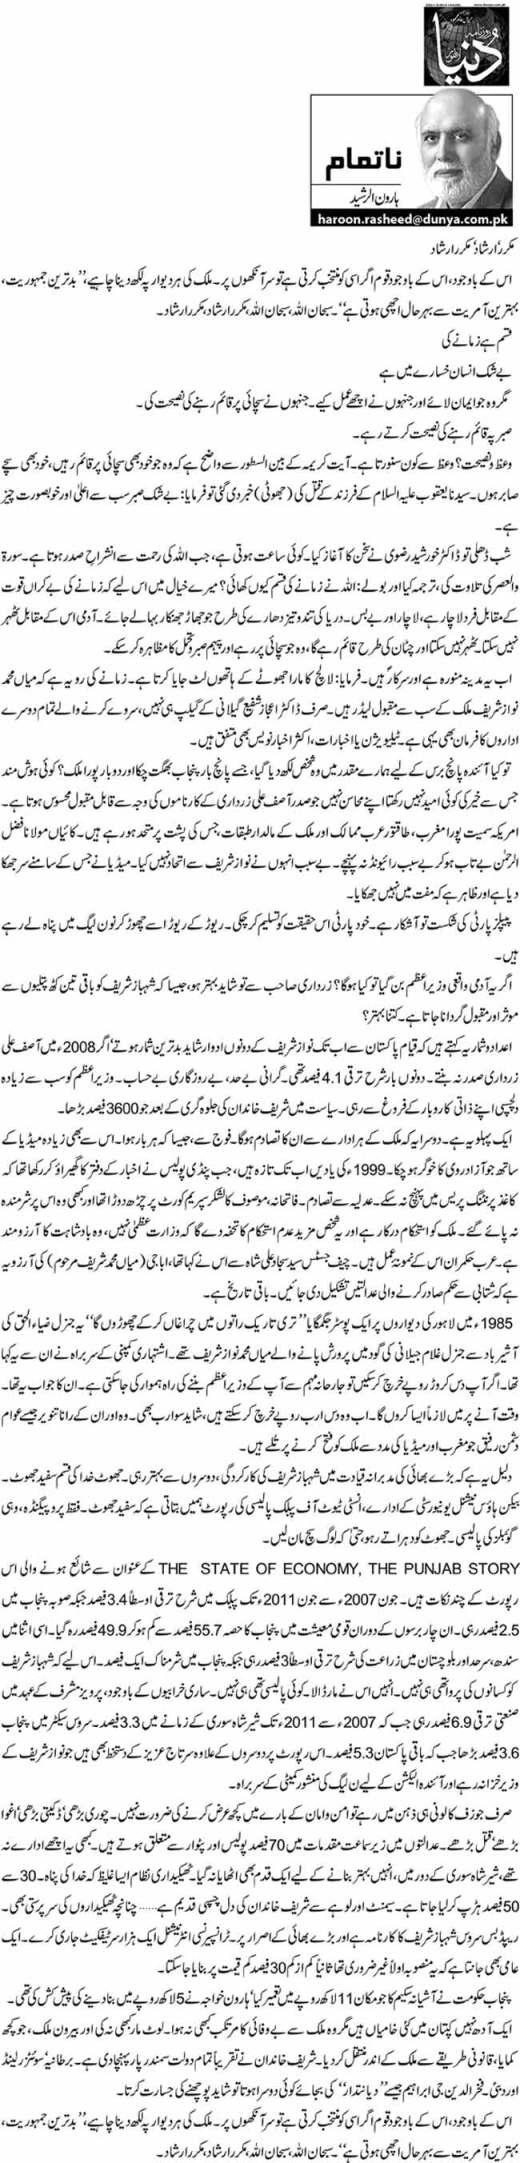 Mukarrar'Irshad'Mukarrar Irshad - Haroon-ur-Rasheed